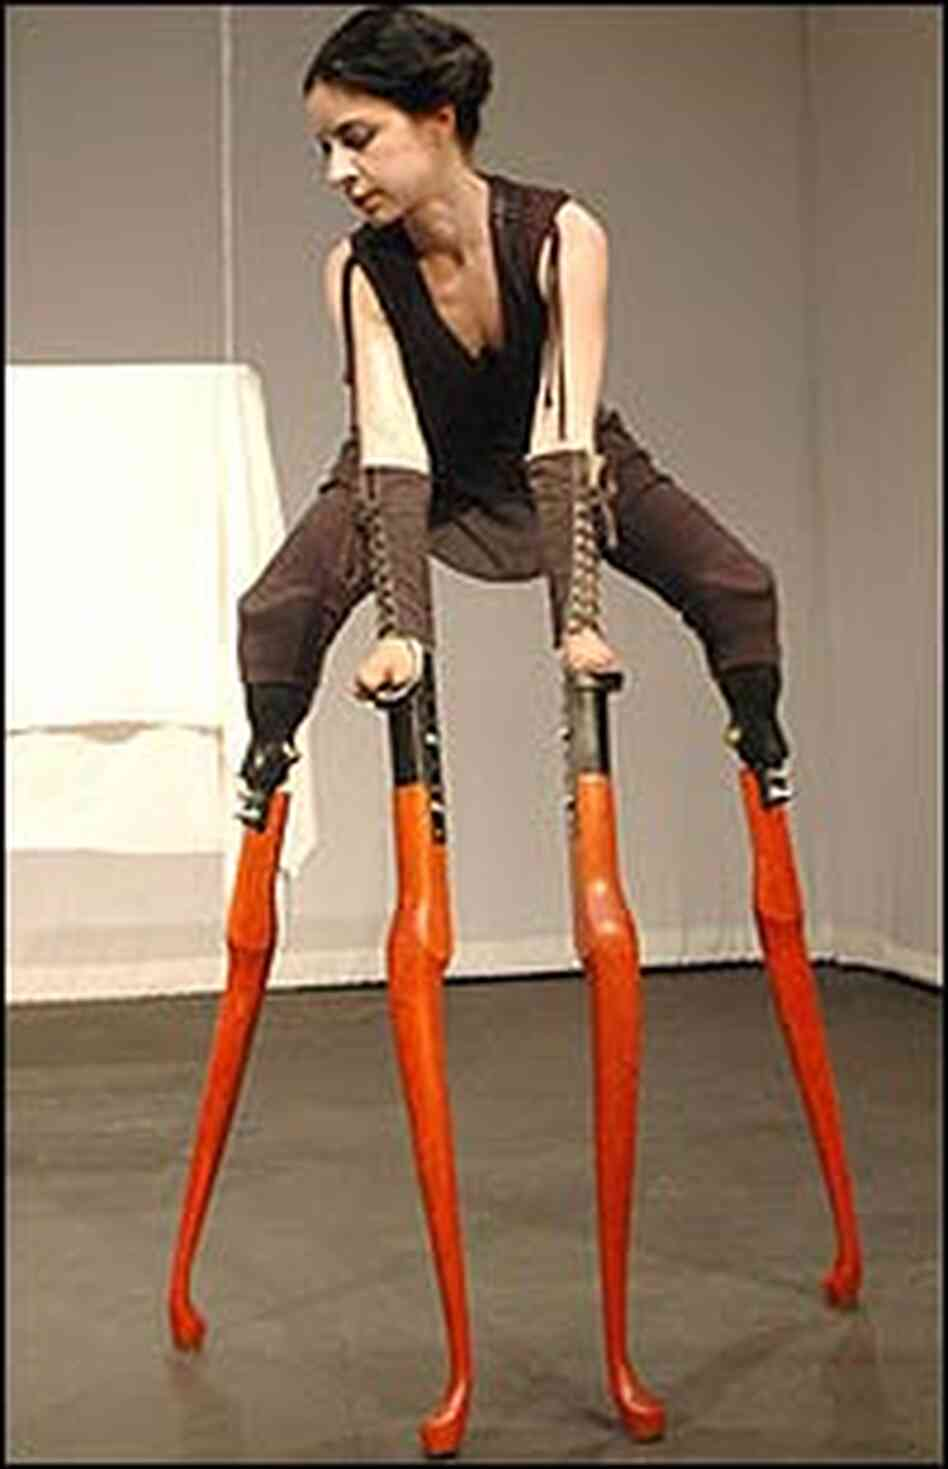 queen anne leg template - artist takes inspiration from amputation npr